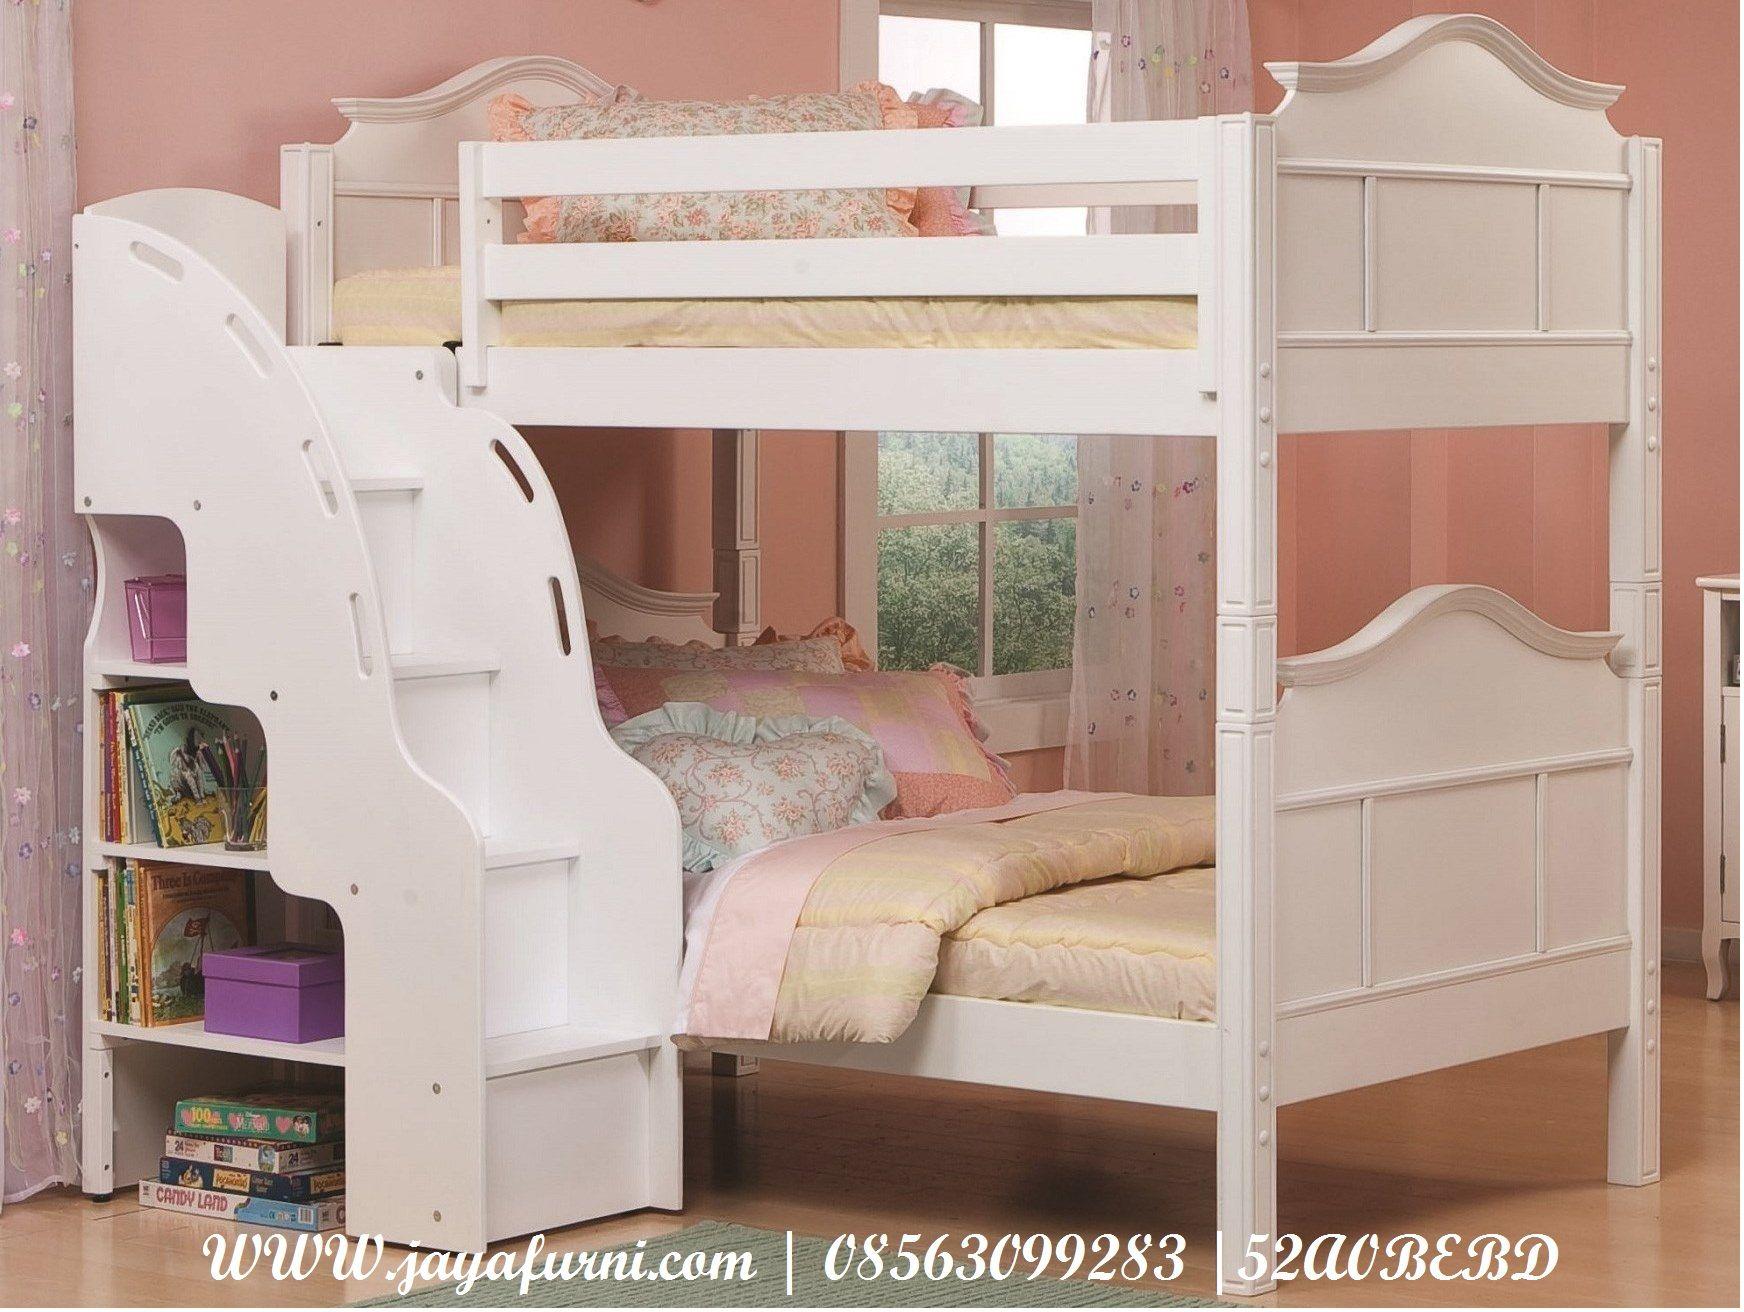 Jual Tempat Tidur Anak Kembar Tingkat Tangga Laci Model Tempat